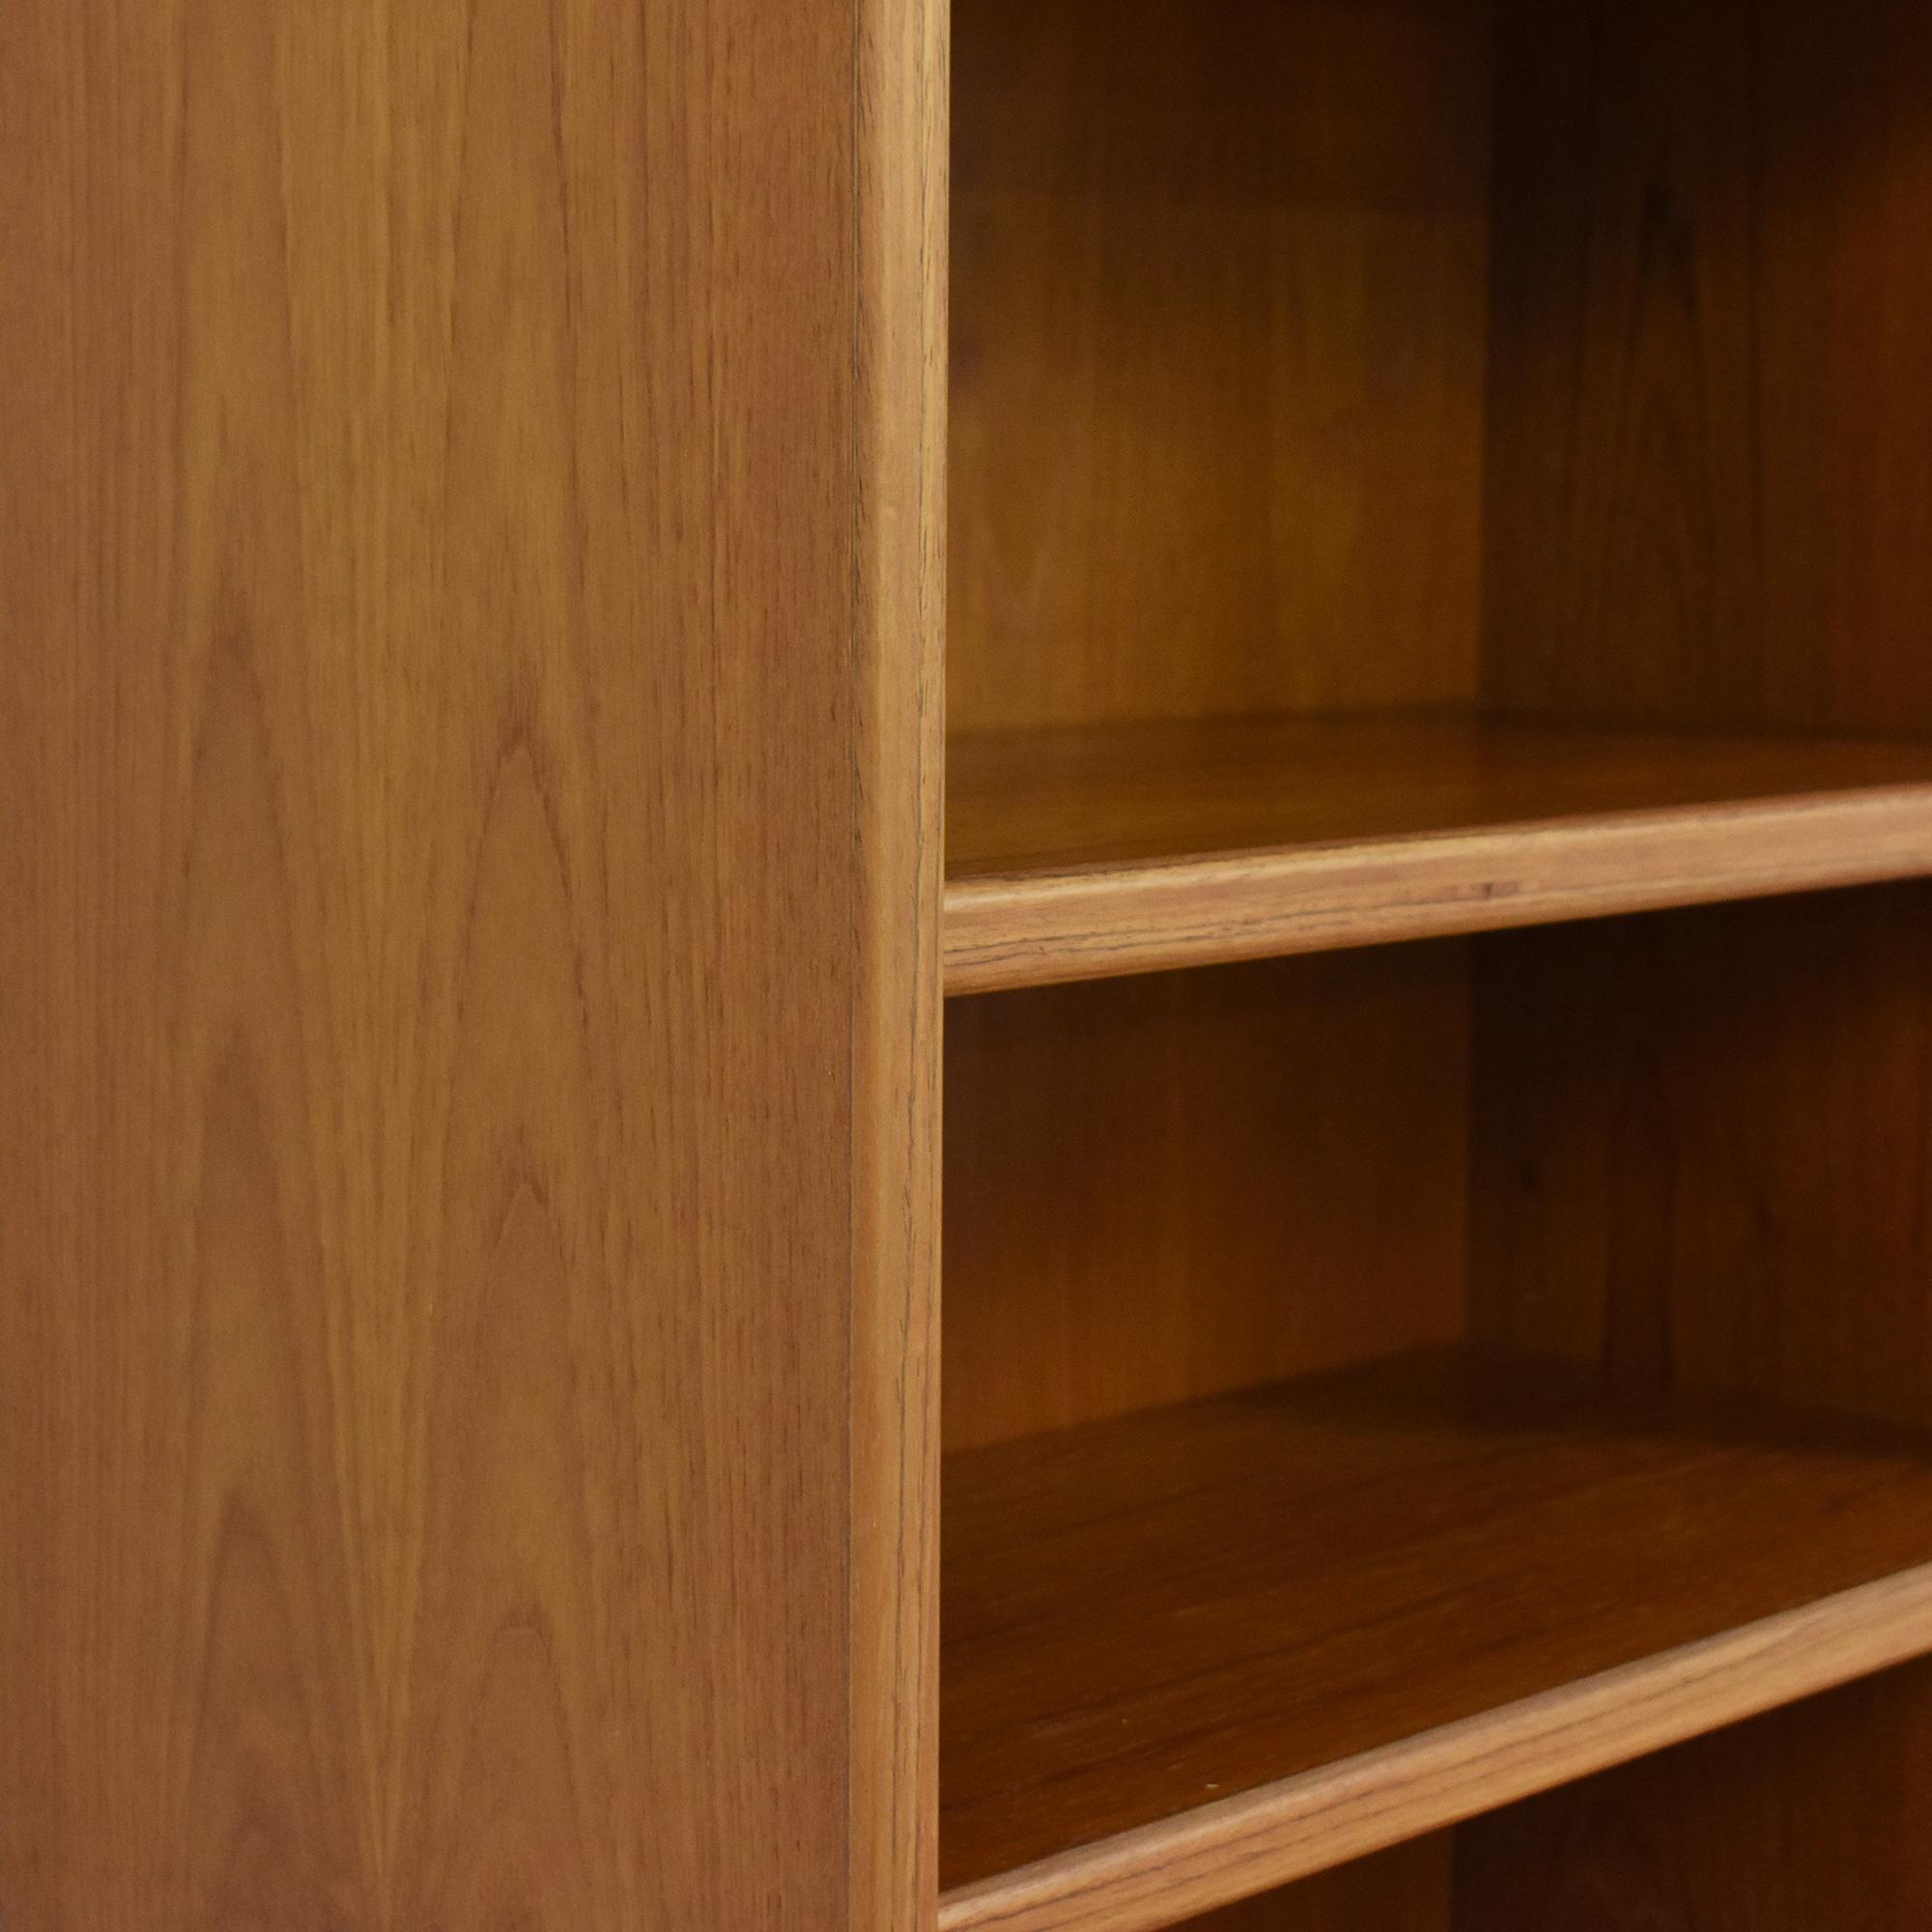 Image of: 65 Off Mid Century Modern Style Danish Bookcase Storage